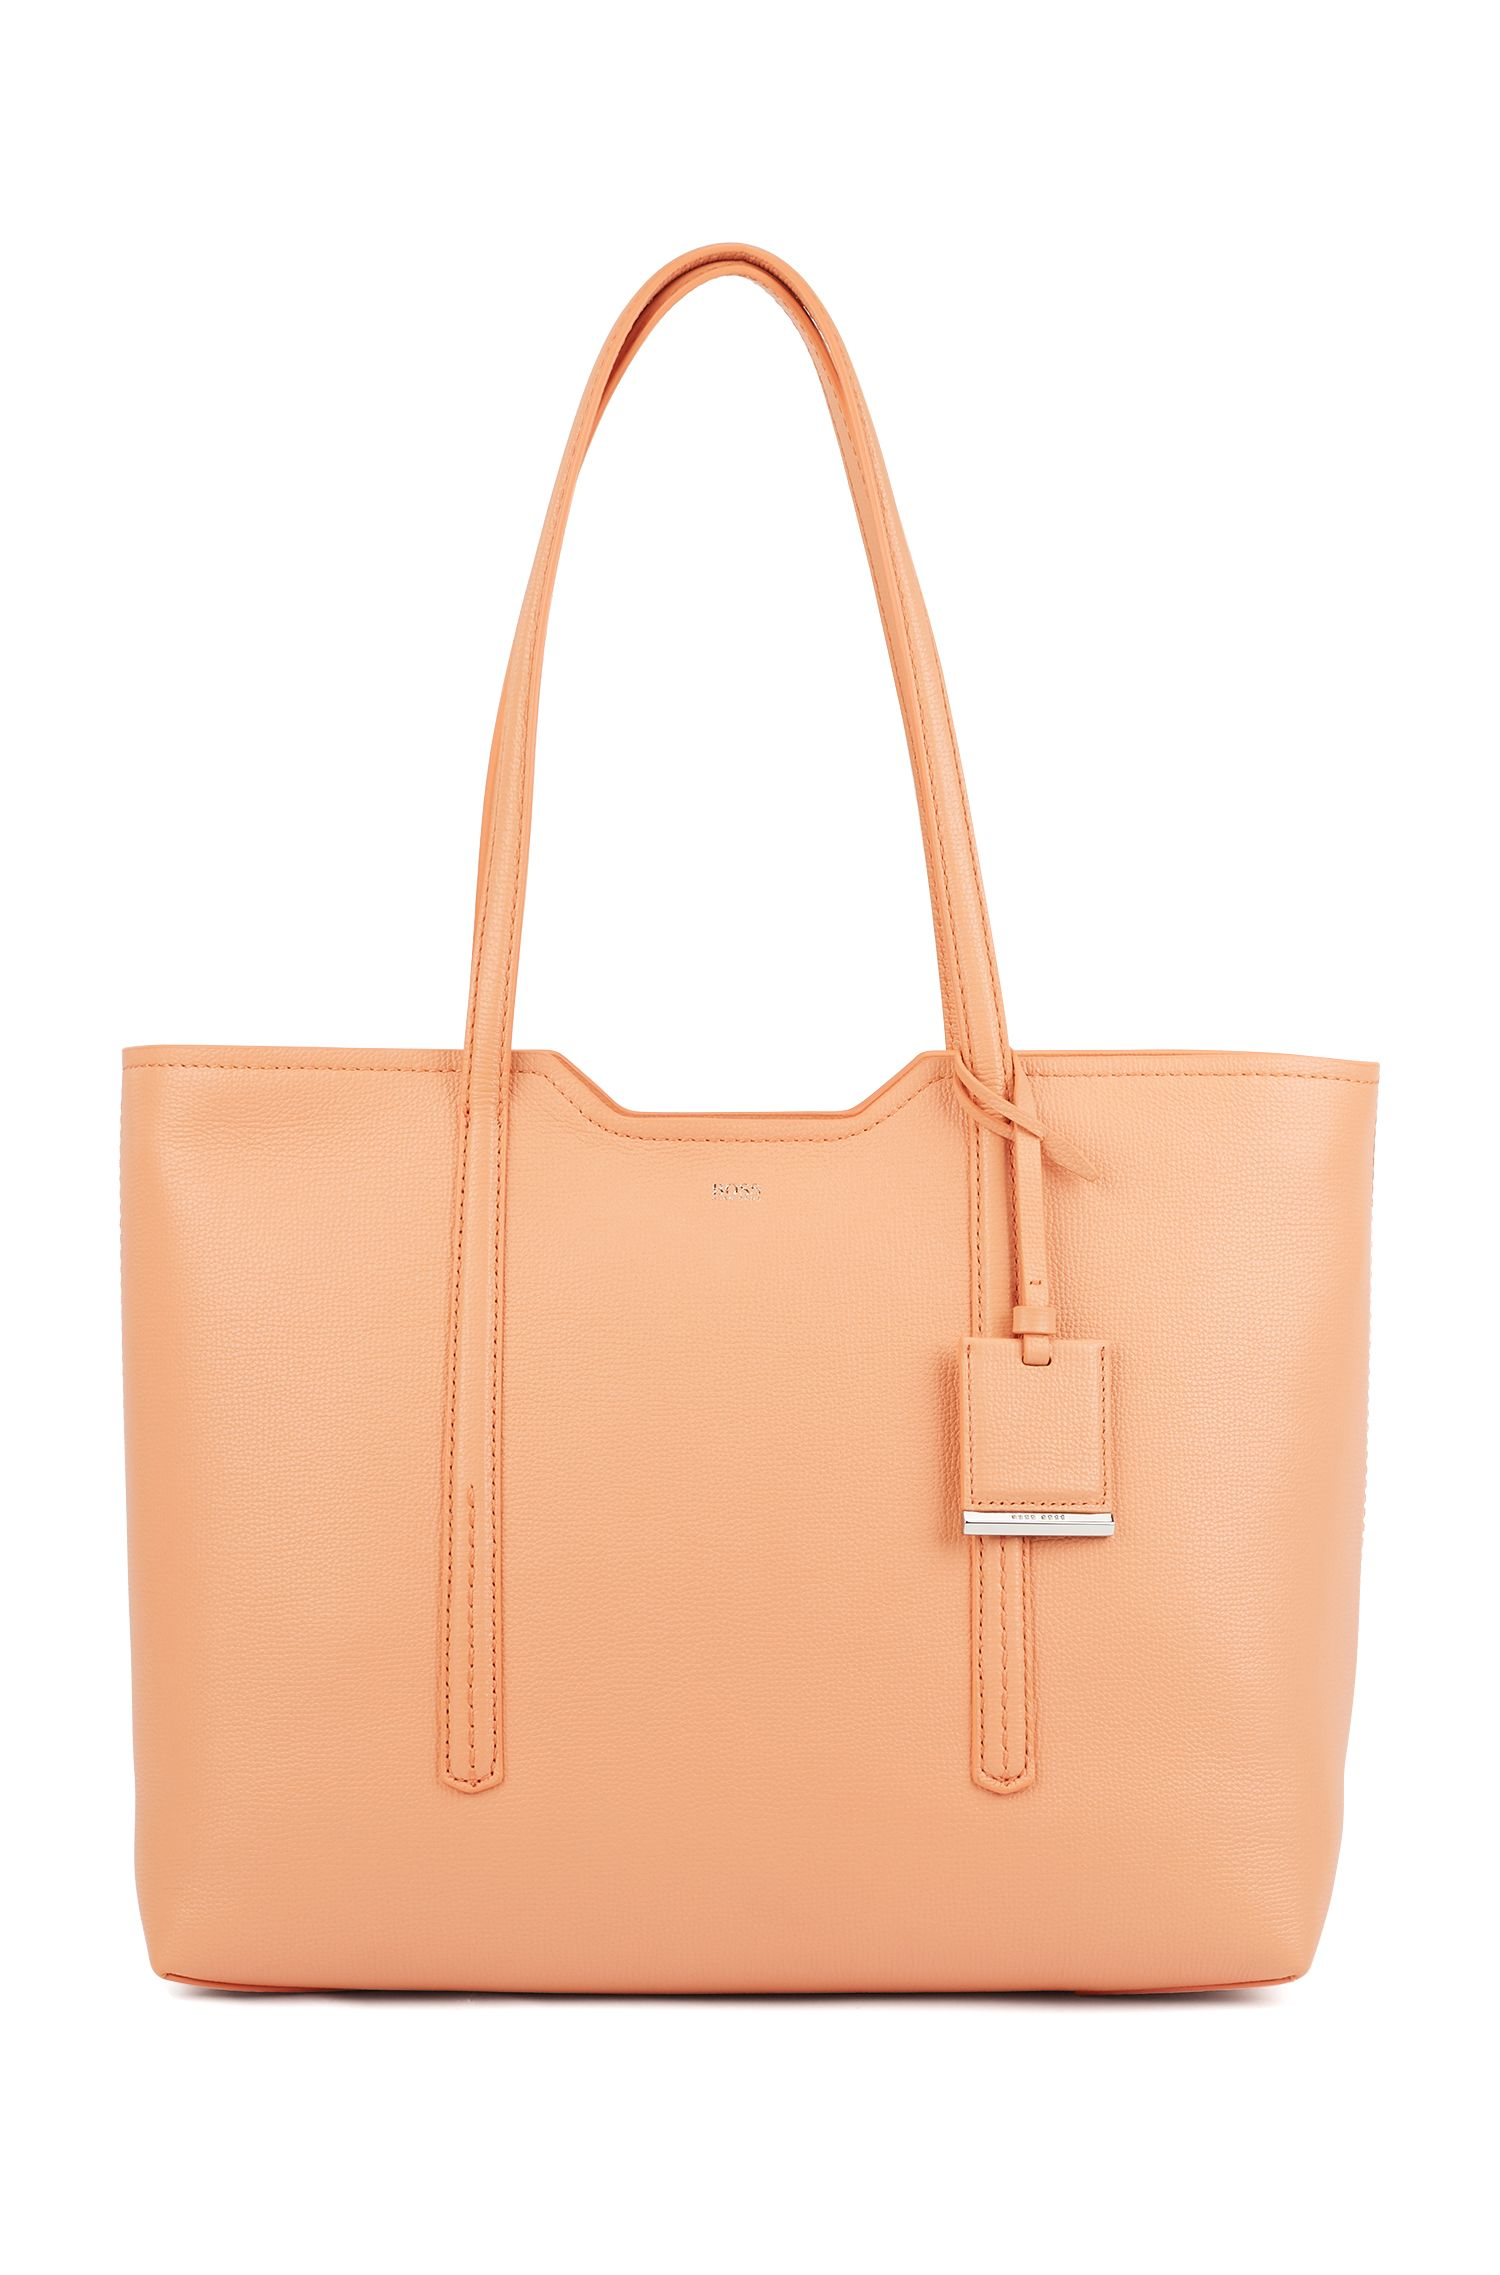 Shopper bag in grained Italian leather, Orange